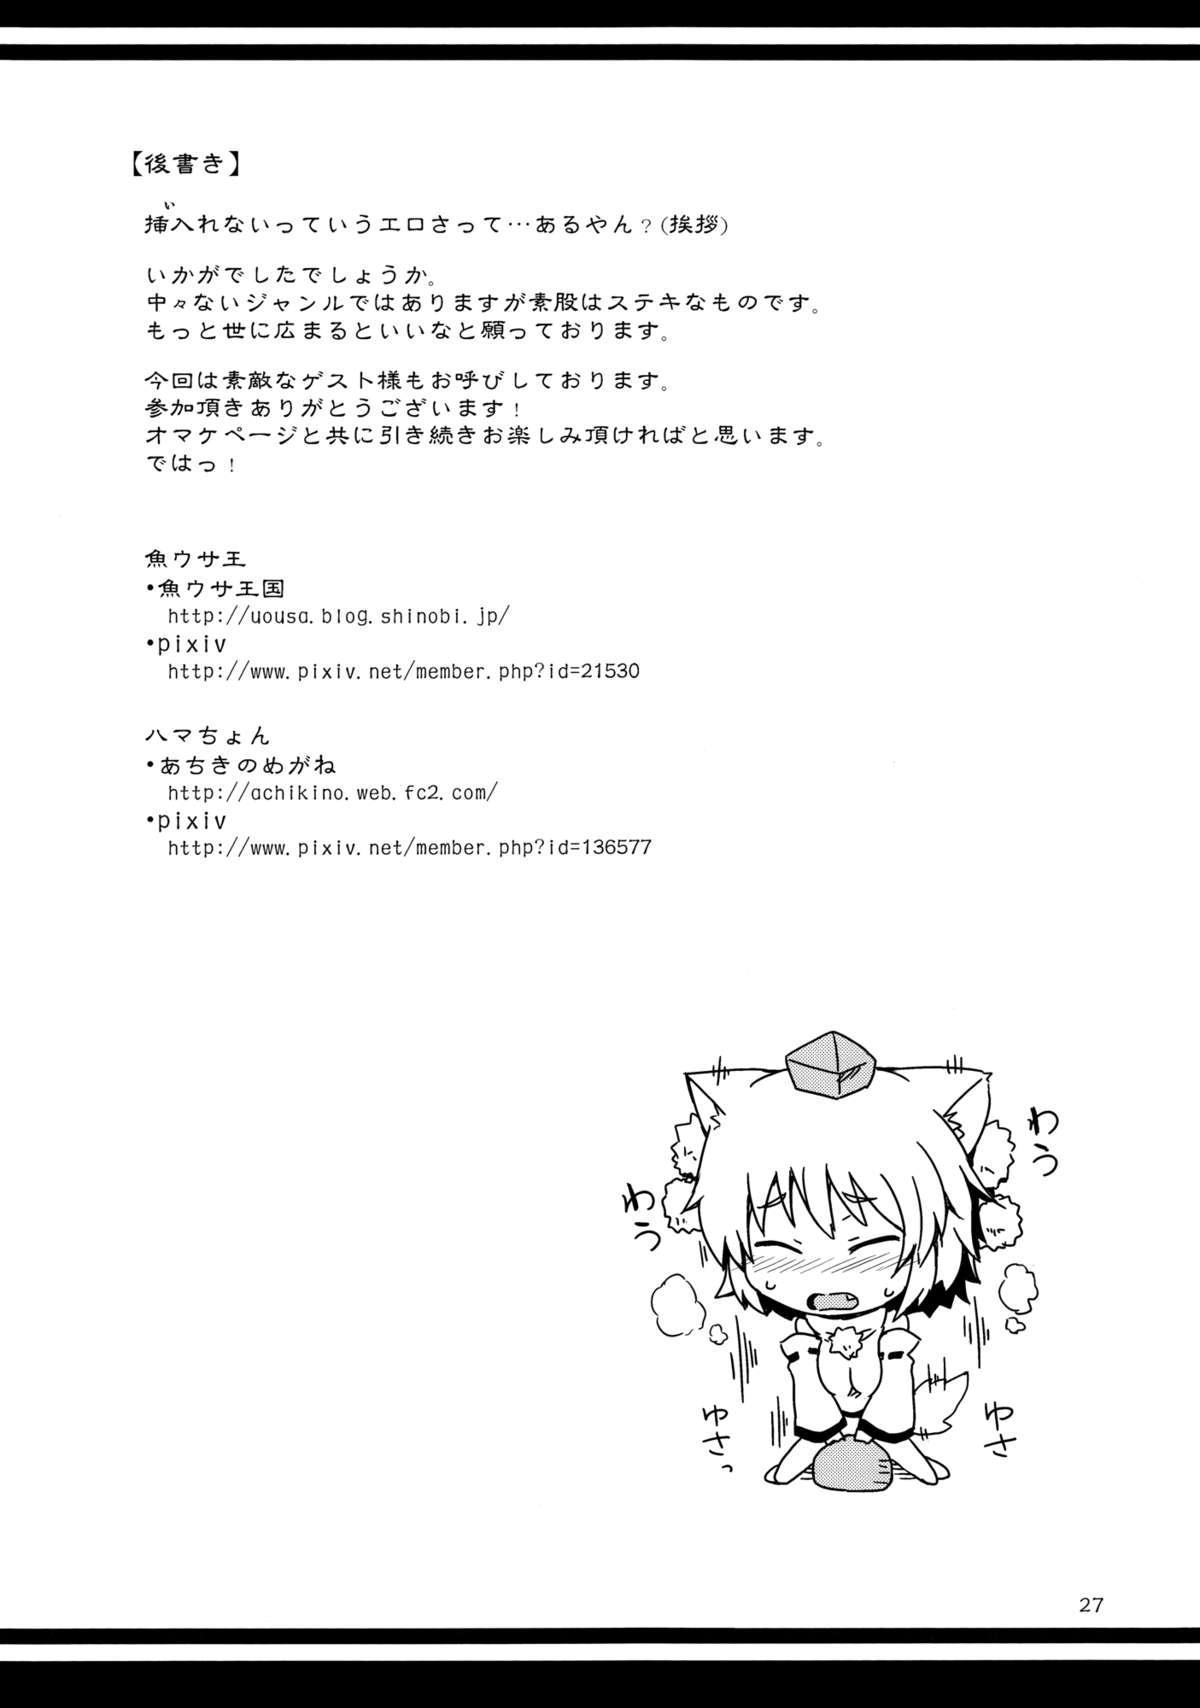 Sumata Goudoushi Omatase 27